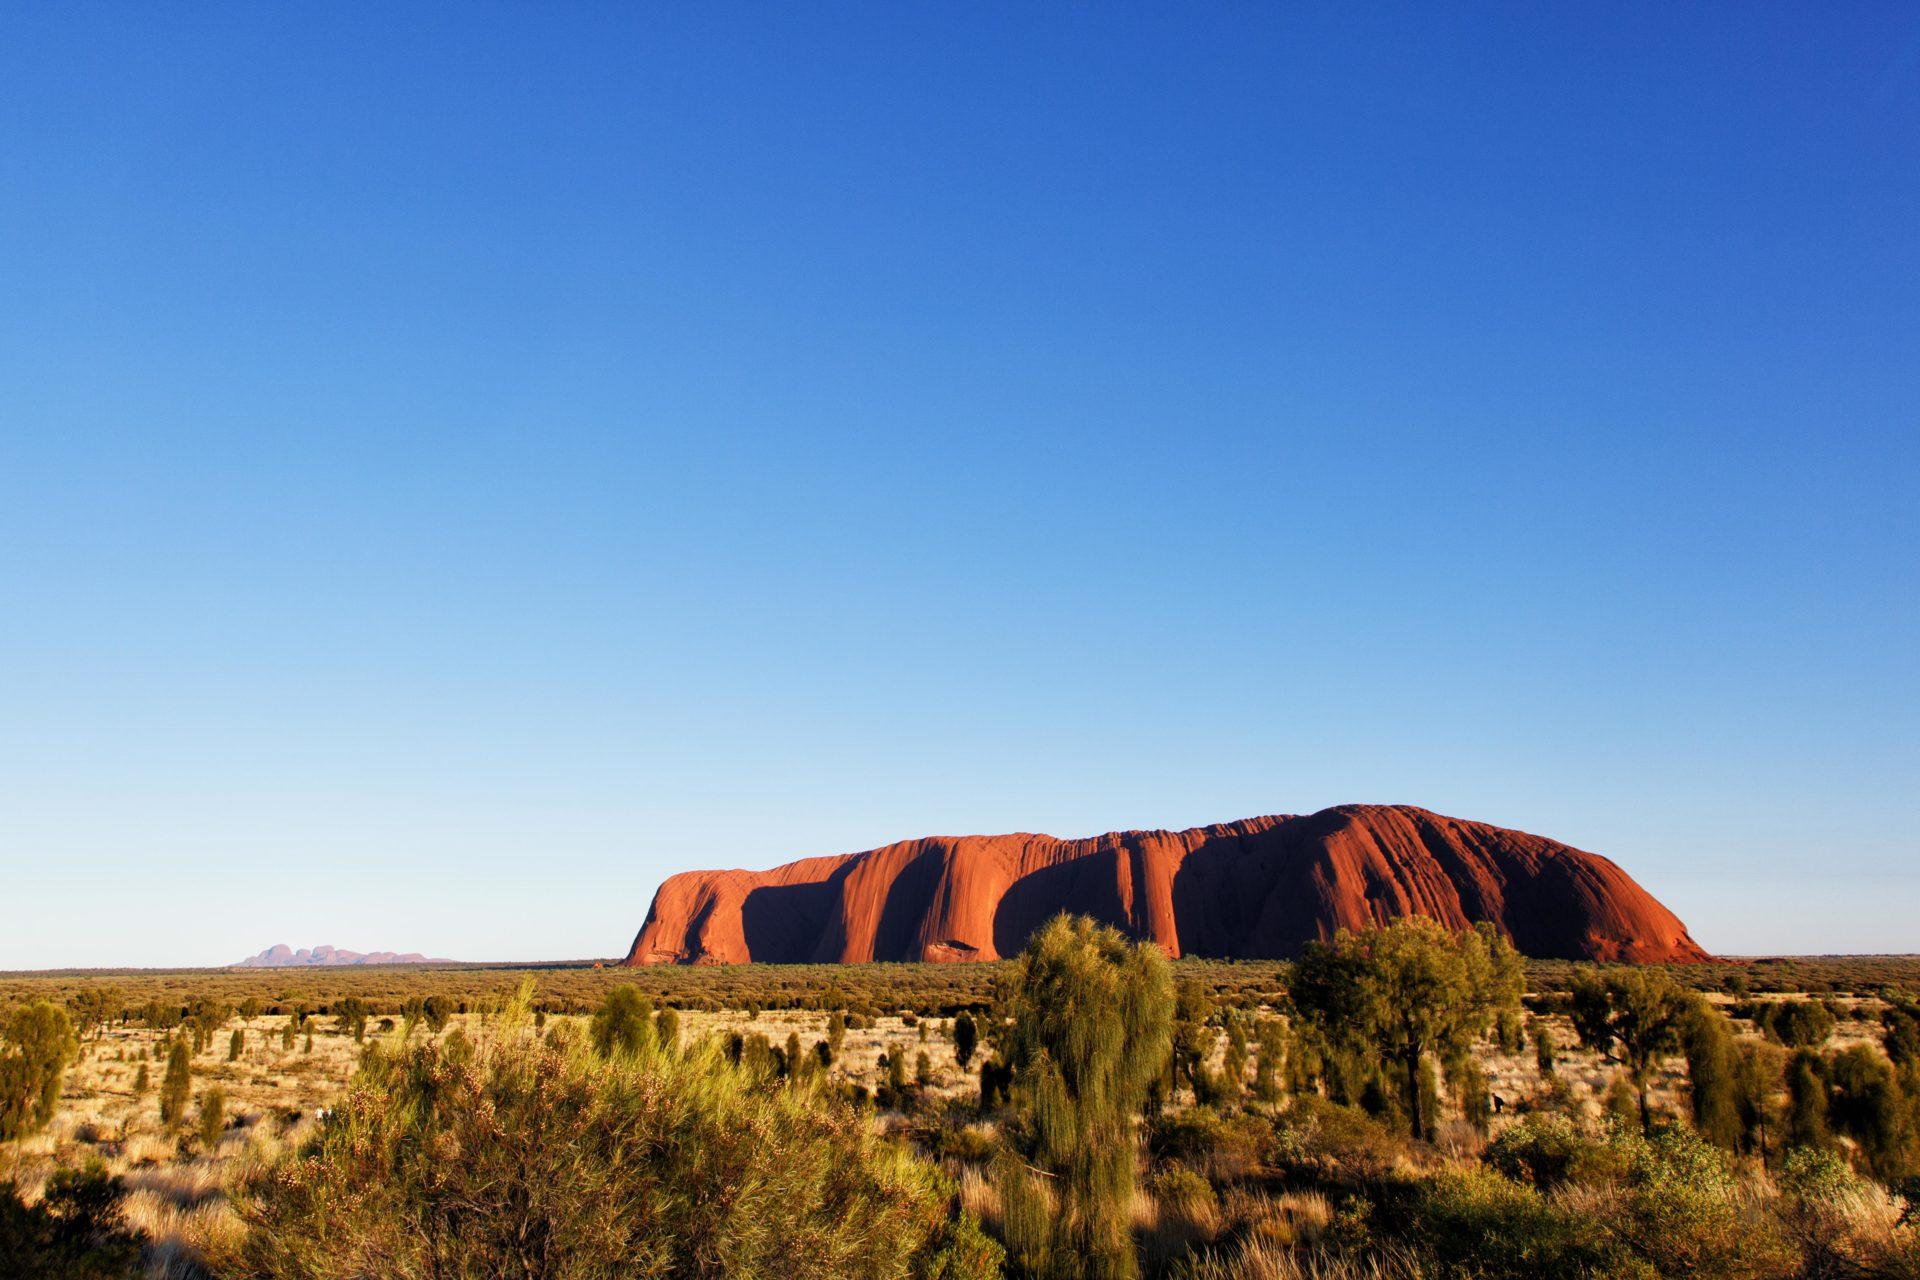 Uluru - Ayers Rock - Australien - Roadtrip